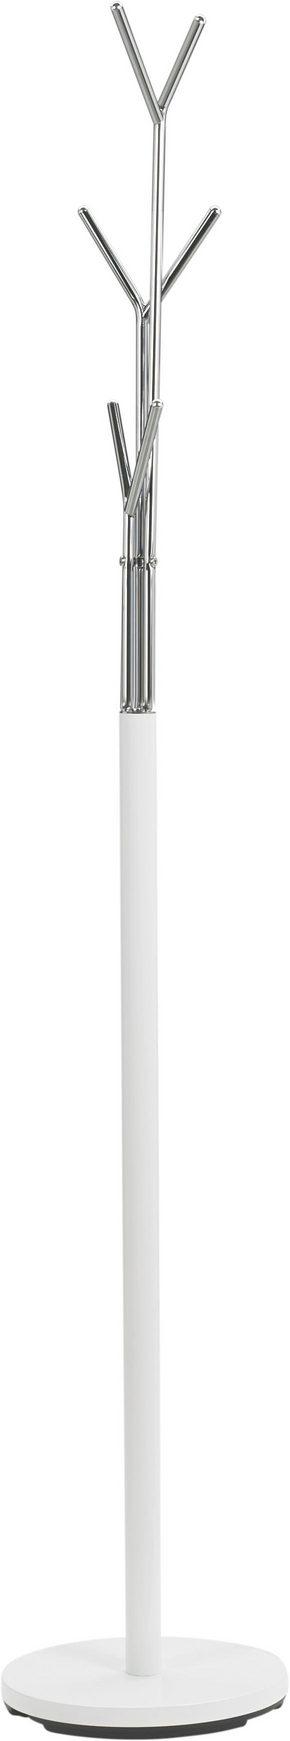 KLÄDHÄNGARE - vit/kromfärg, Design, metall (29/171/29cm) - Low Price